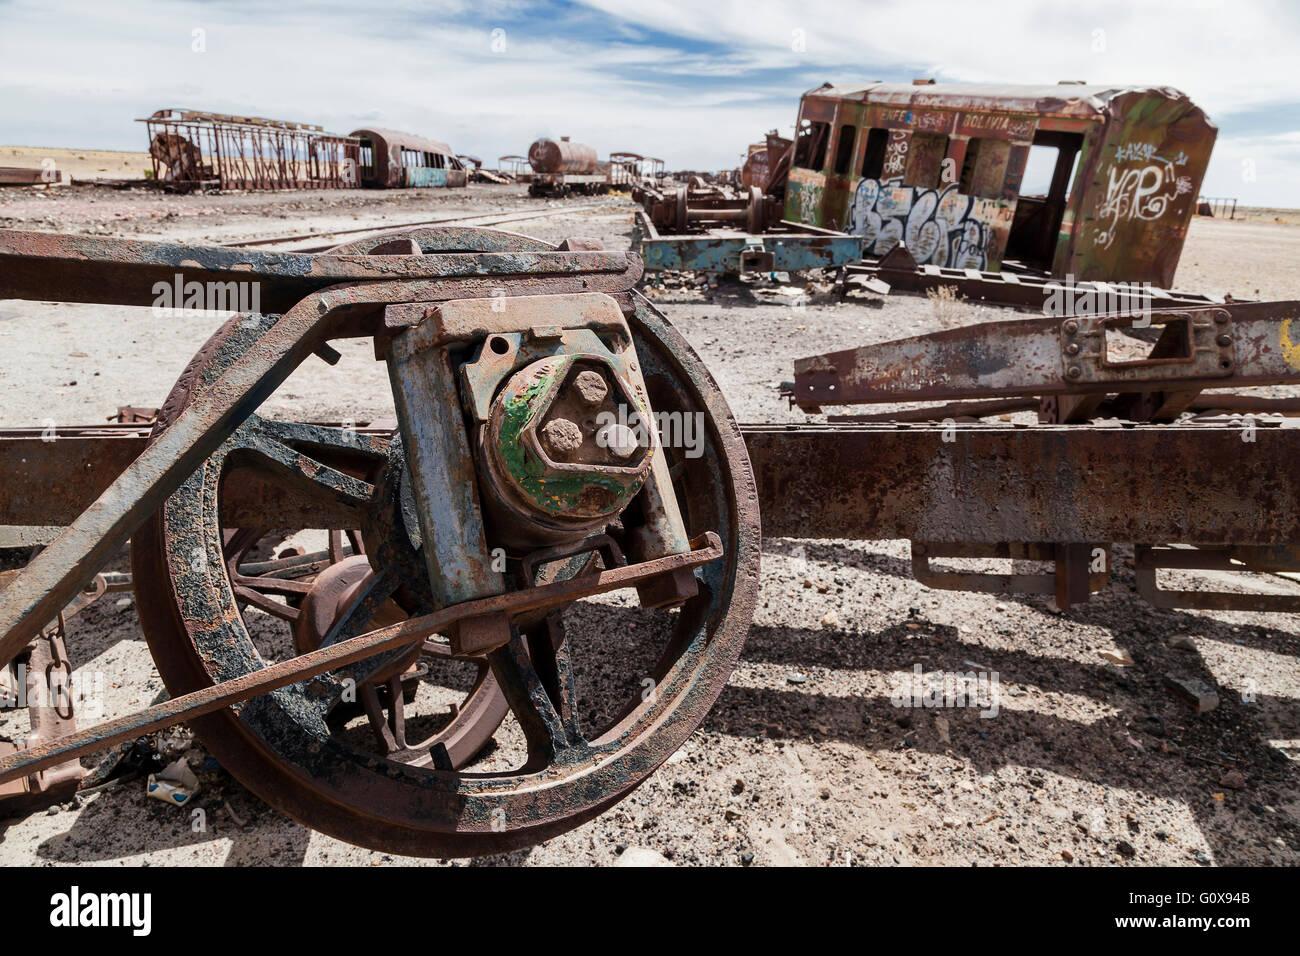 The End of the Line. An abandoned railway engine, Salar de Uyuni, Bolivia, South America. Stock Photo